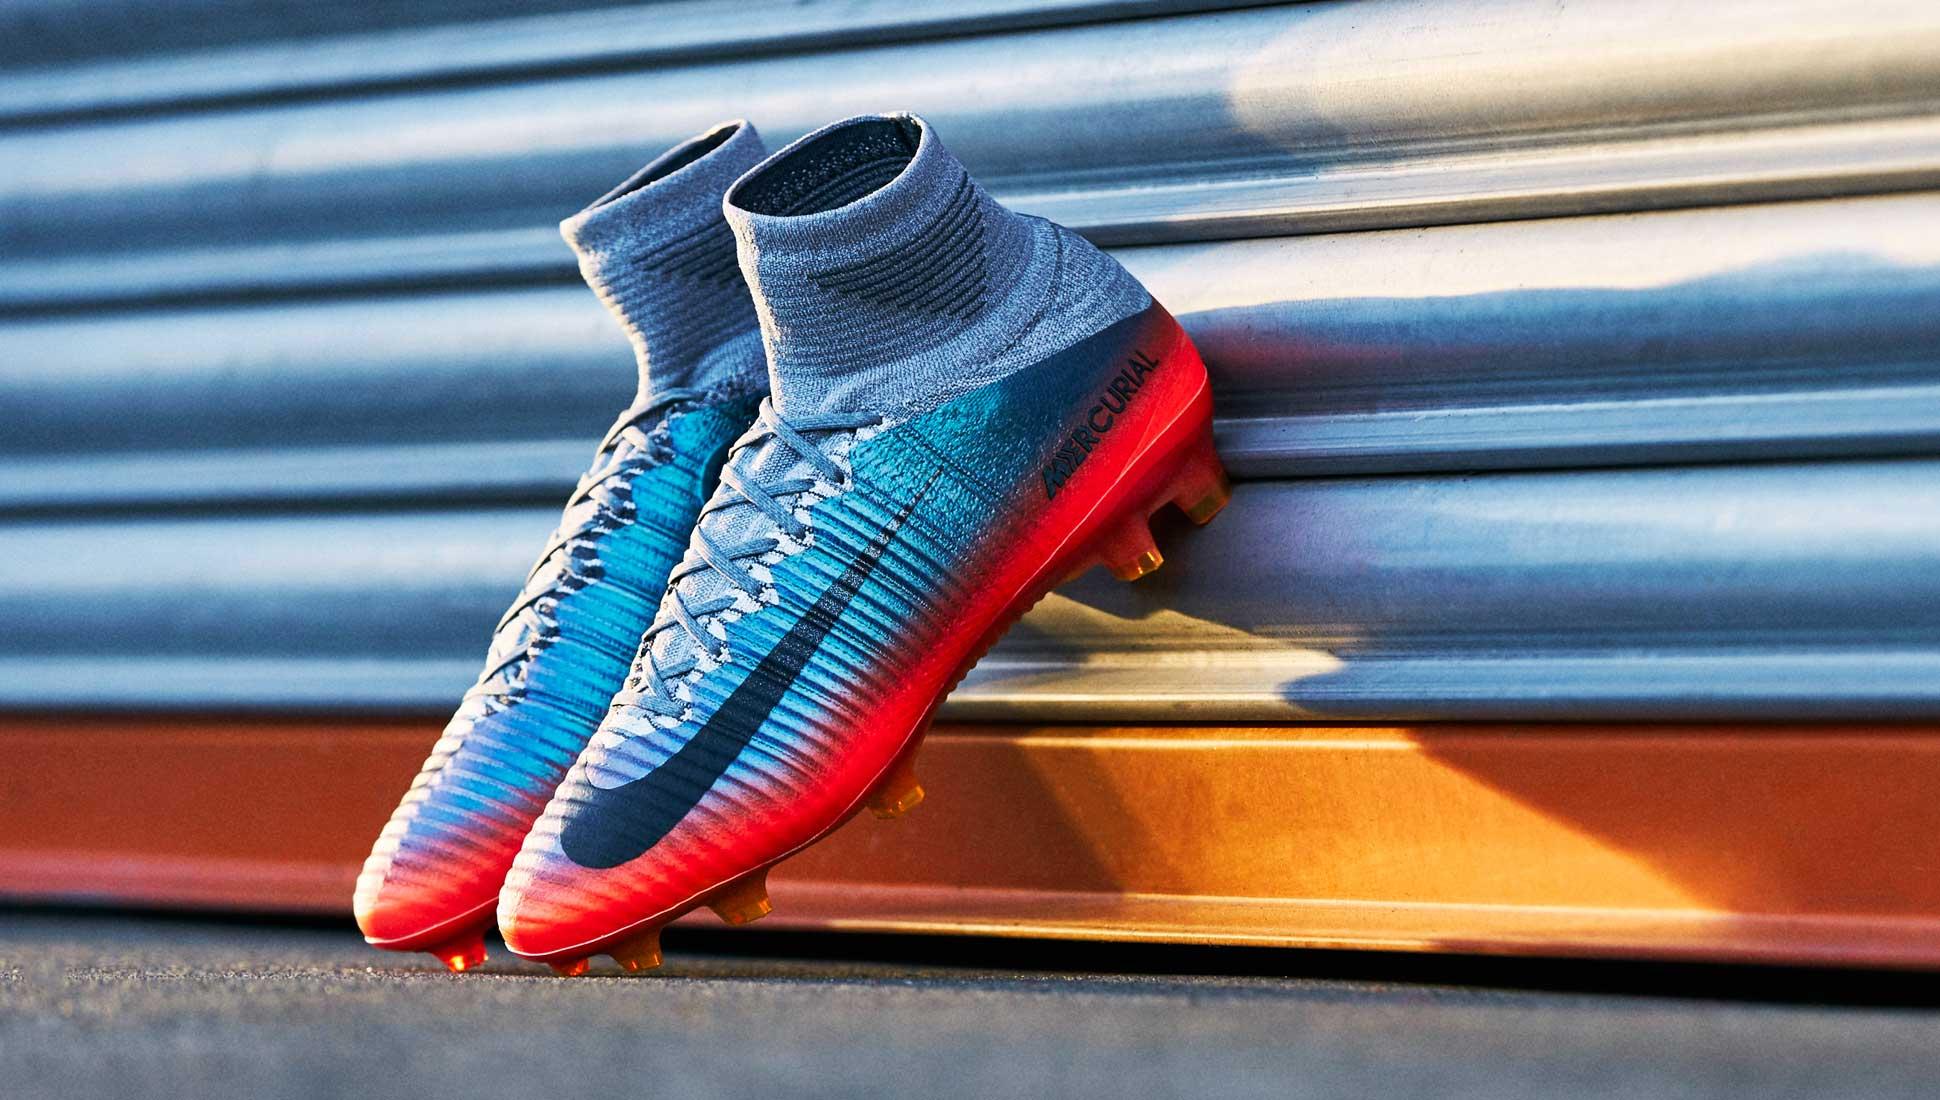 9861b3d2b Nike Mercurial CR7 Chapter 4 Football Boots - SoccerBible